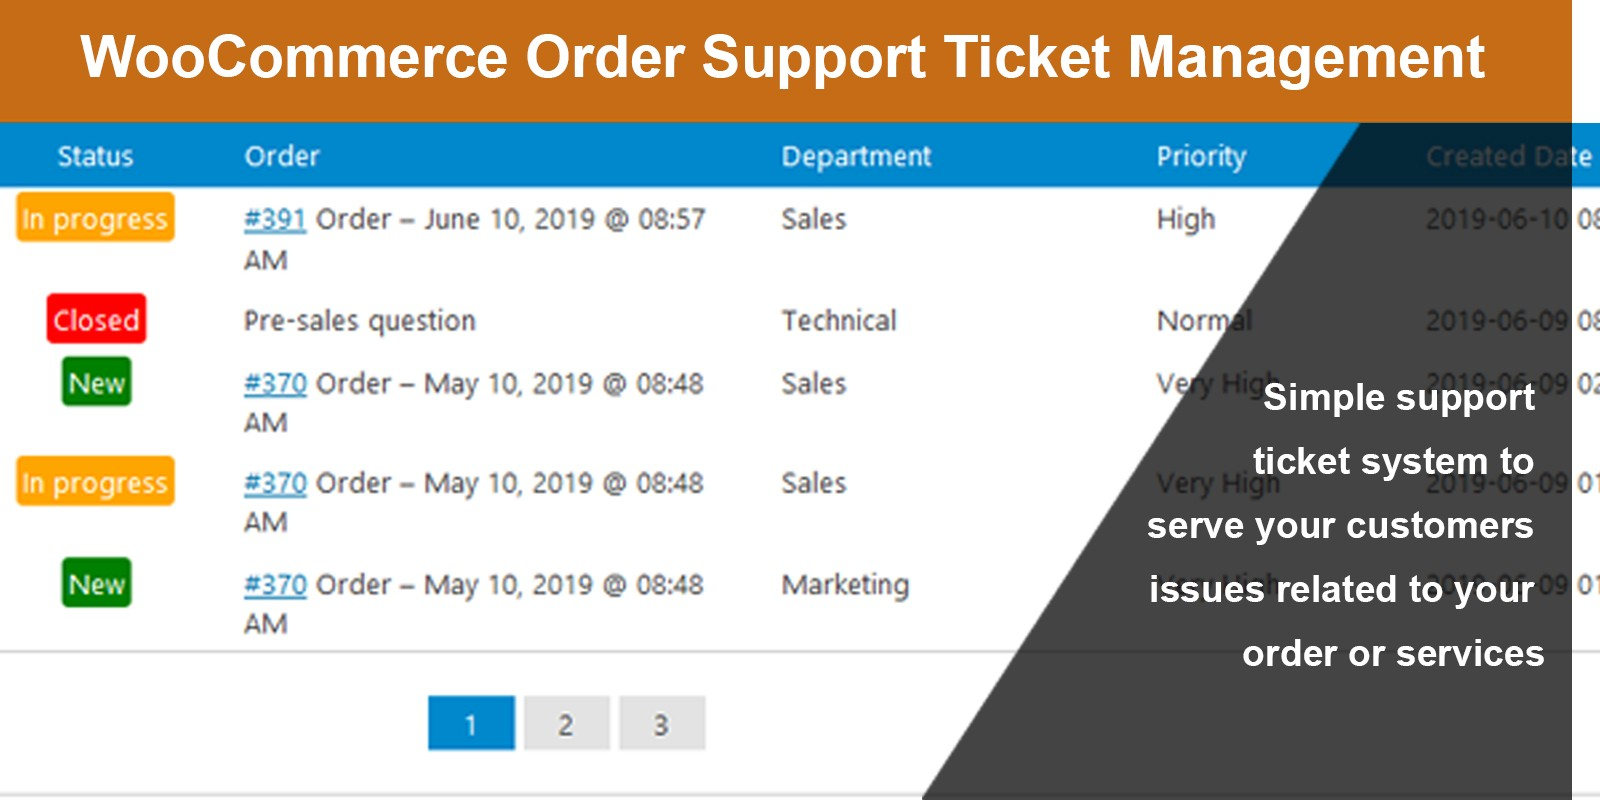 Order Support Ticket Management For WooCommerce